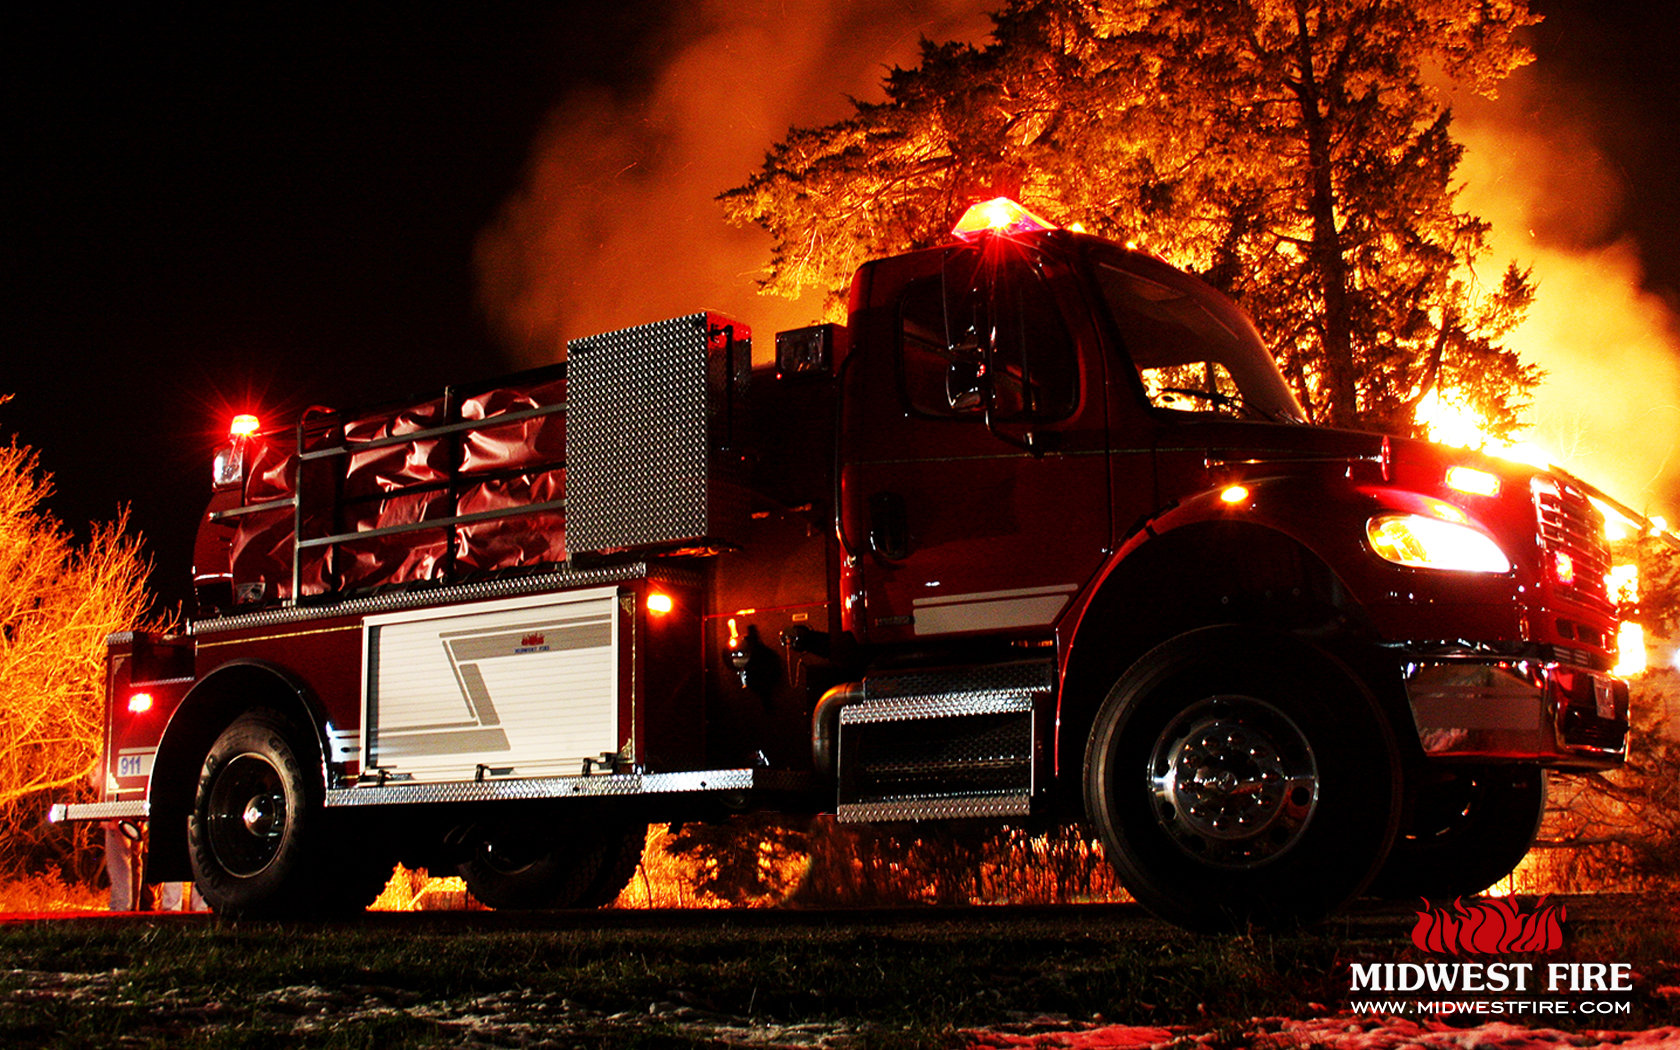 Fire Truck HD Backgrounds For 1680x1050 Desktop